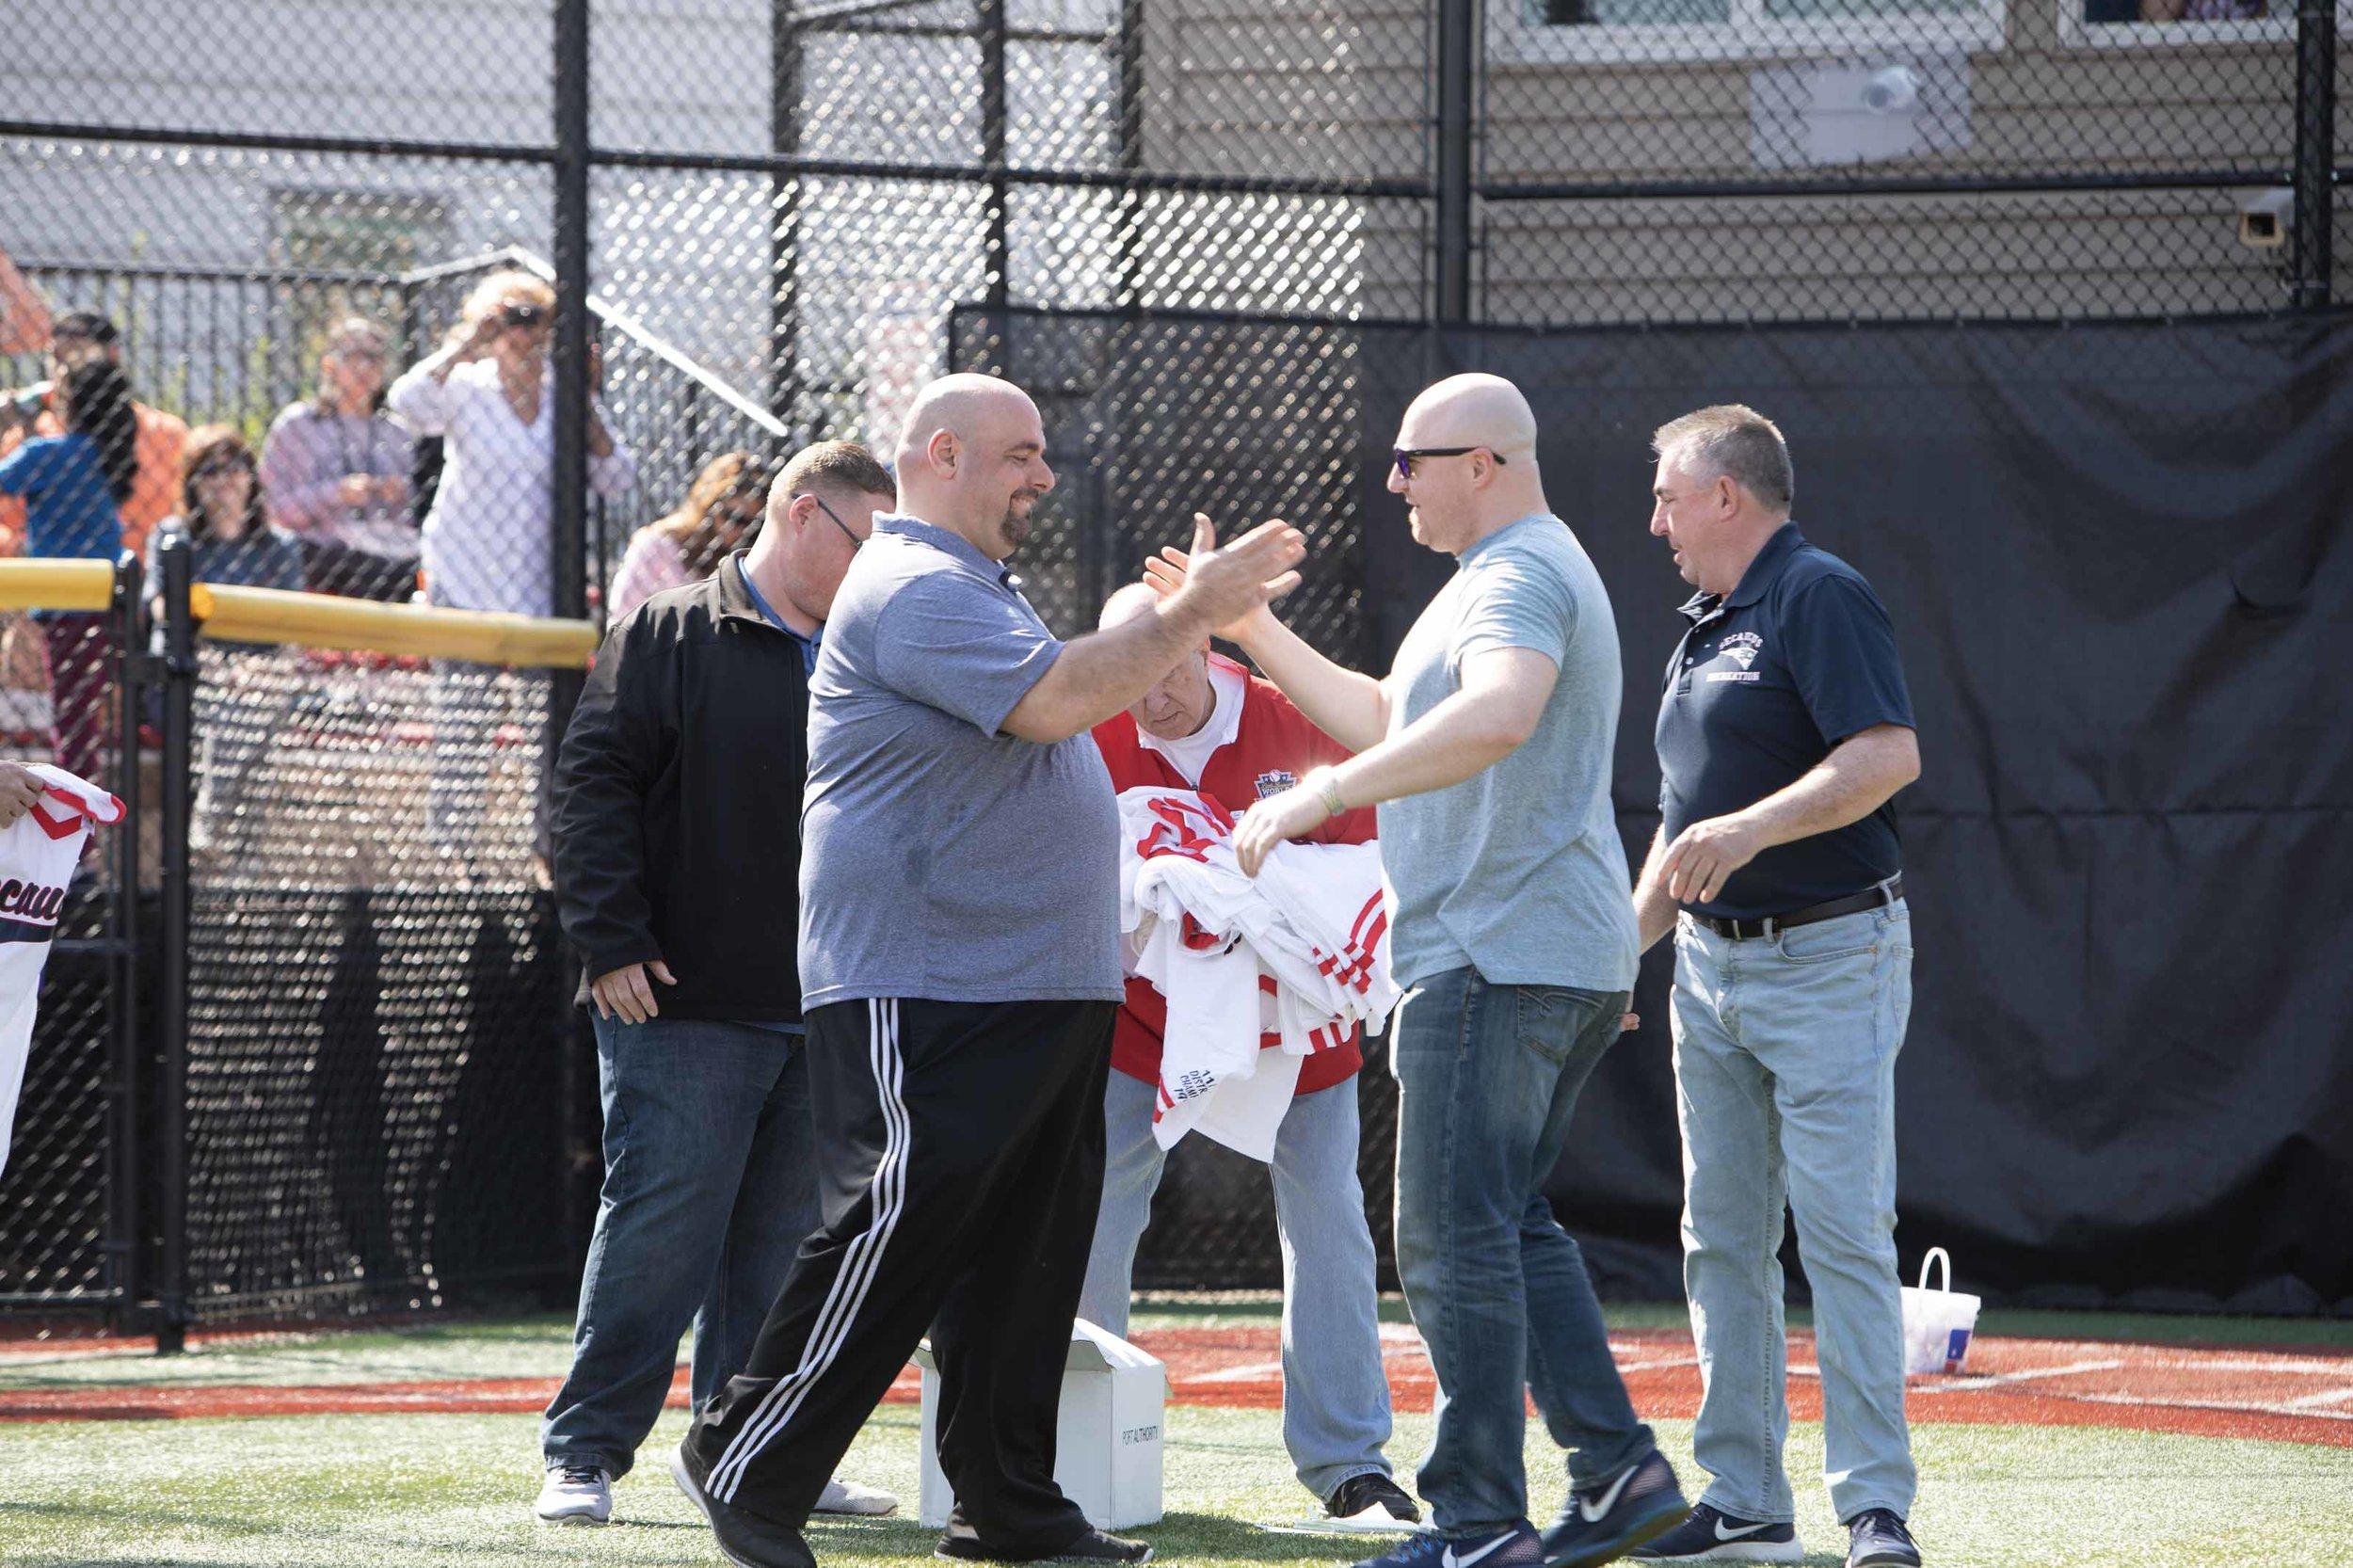 27-Seacacus Little League Kick Off 2018 (116 of 890).jpg